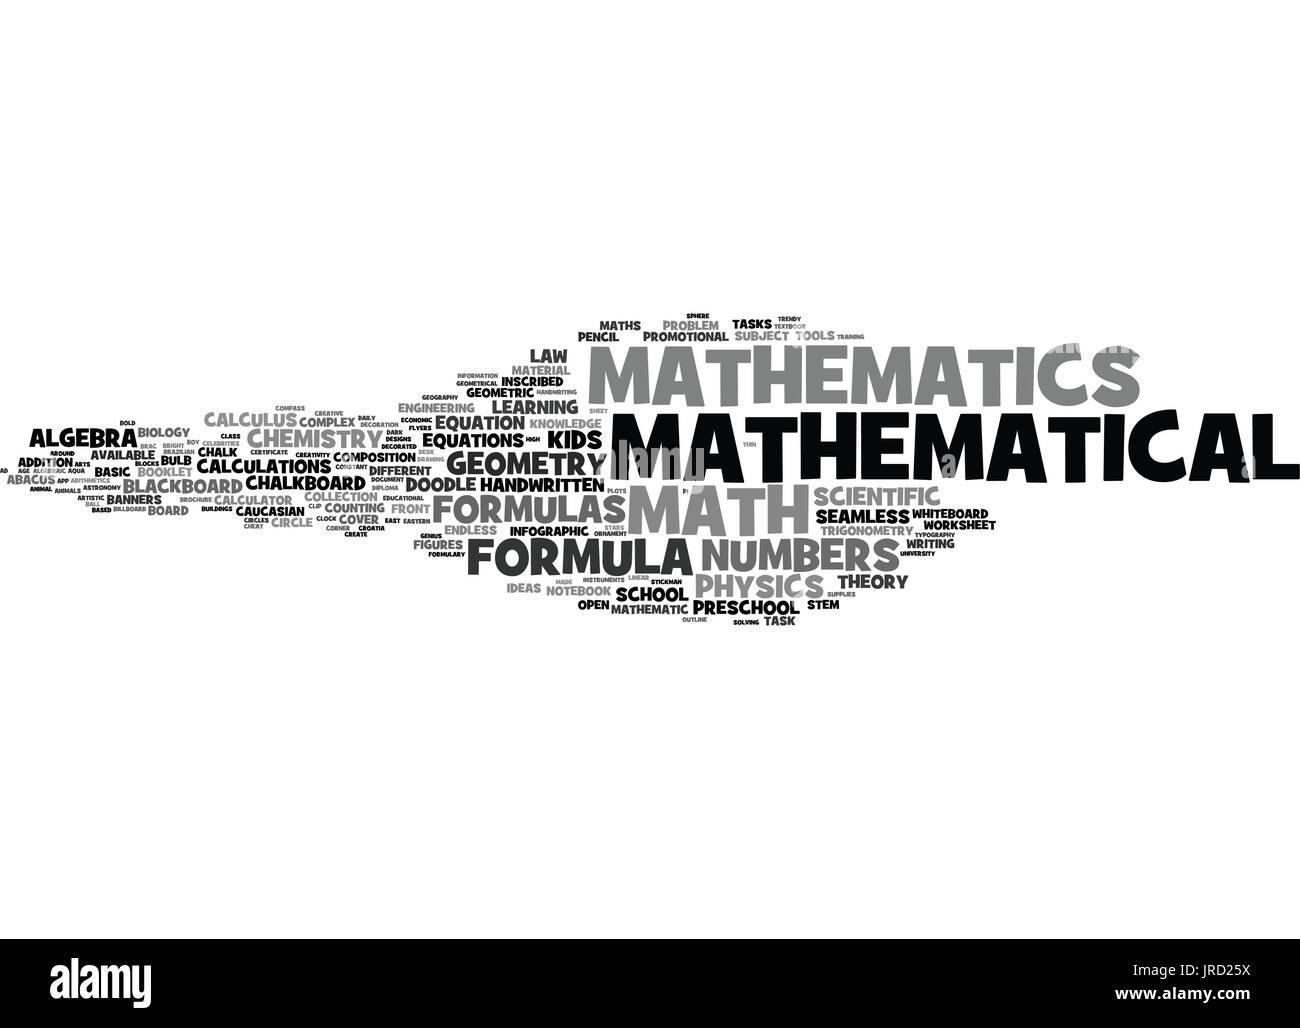 mathematical formulas black and white stock photos & images - alamy